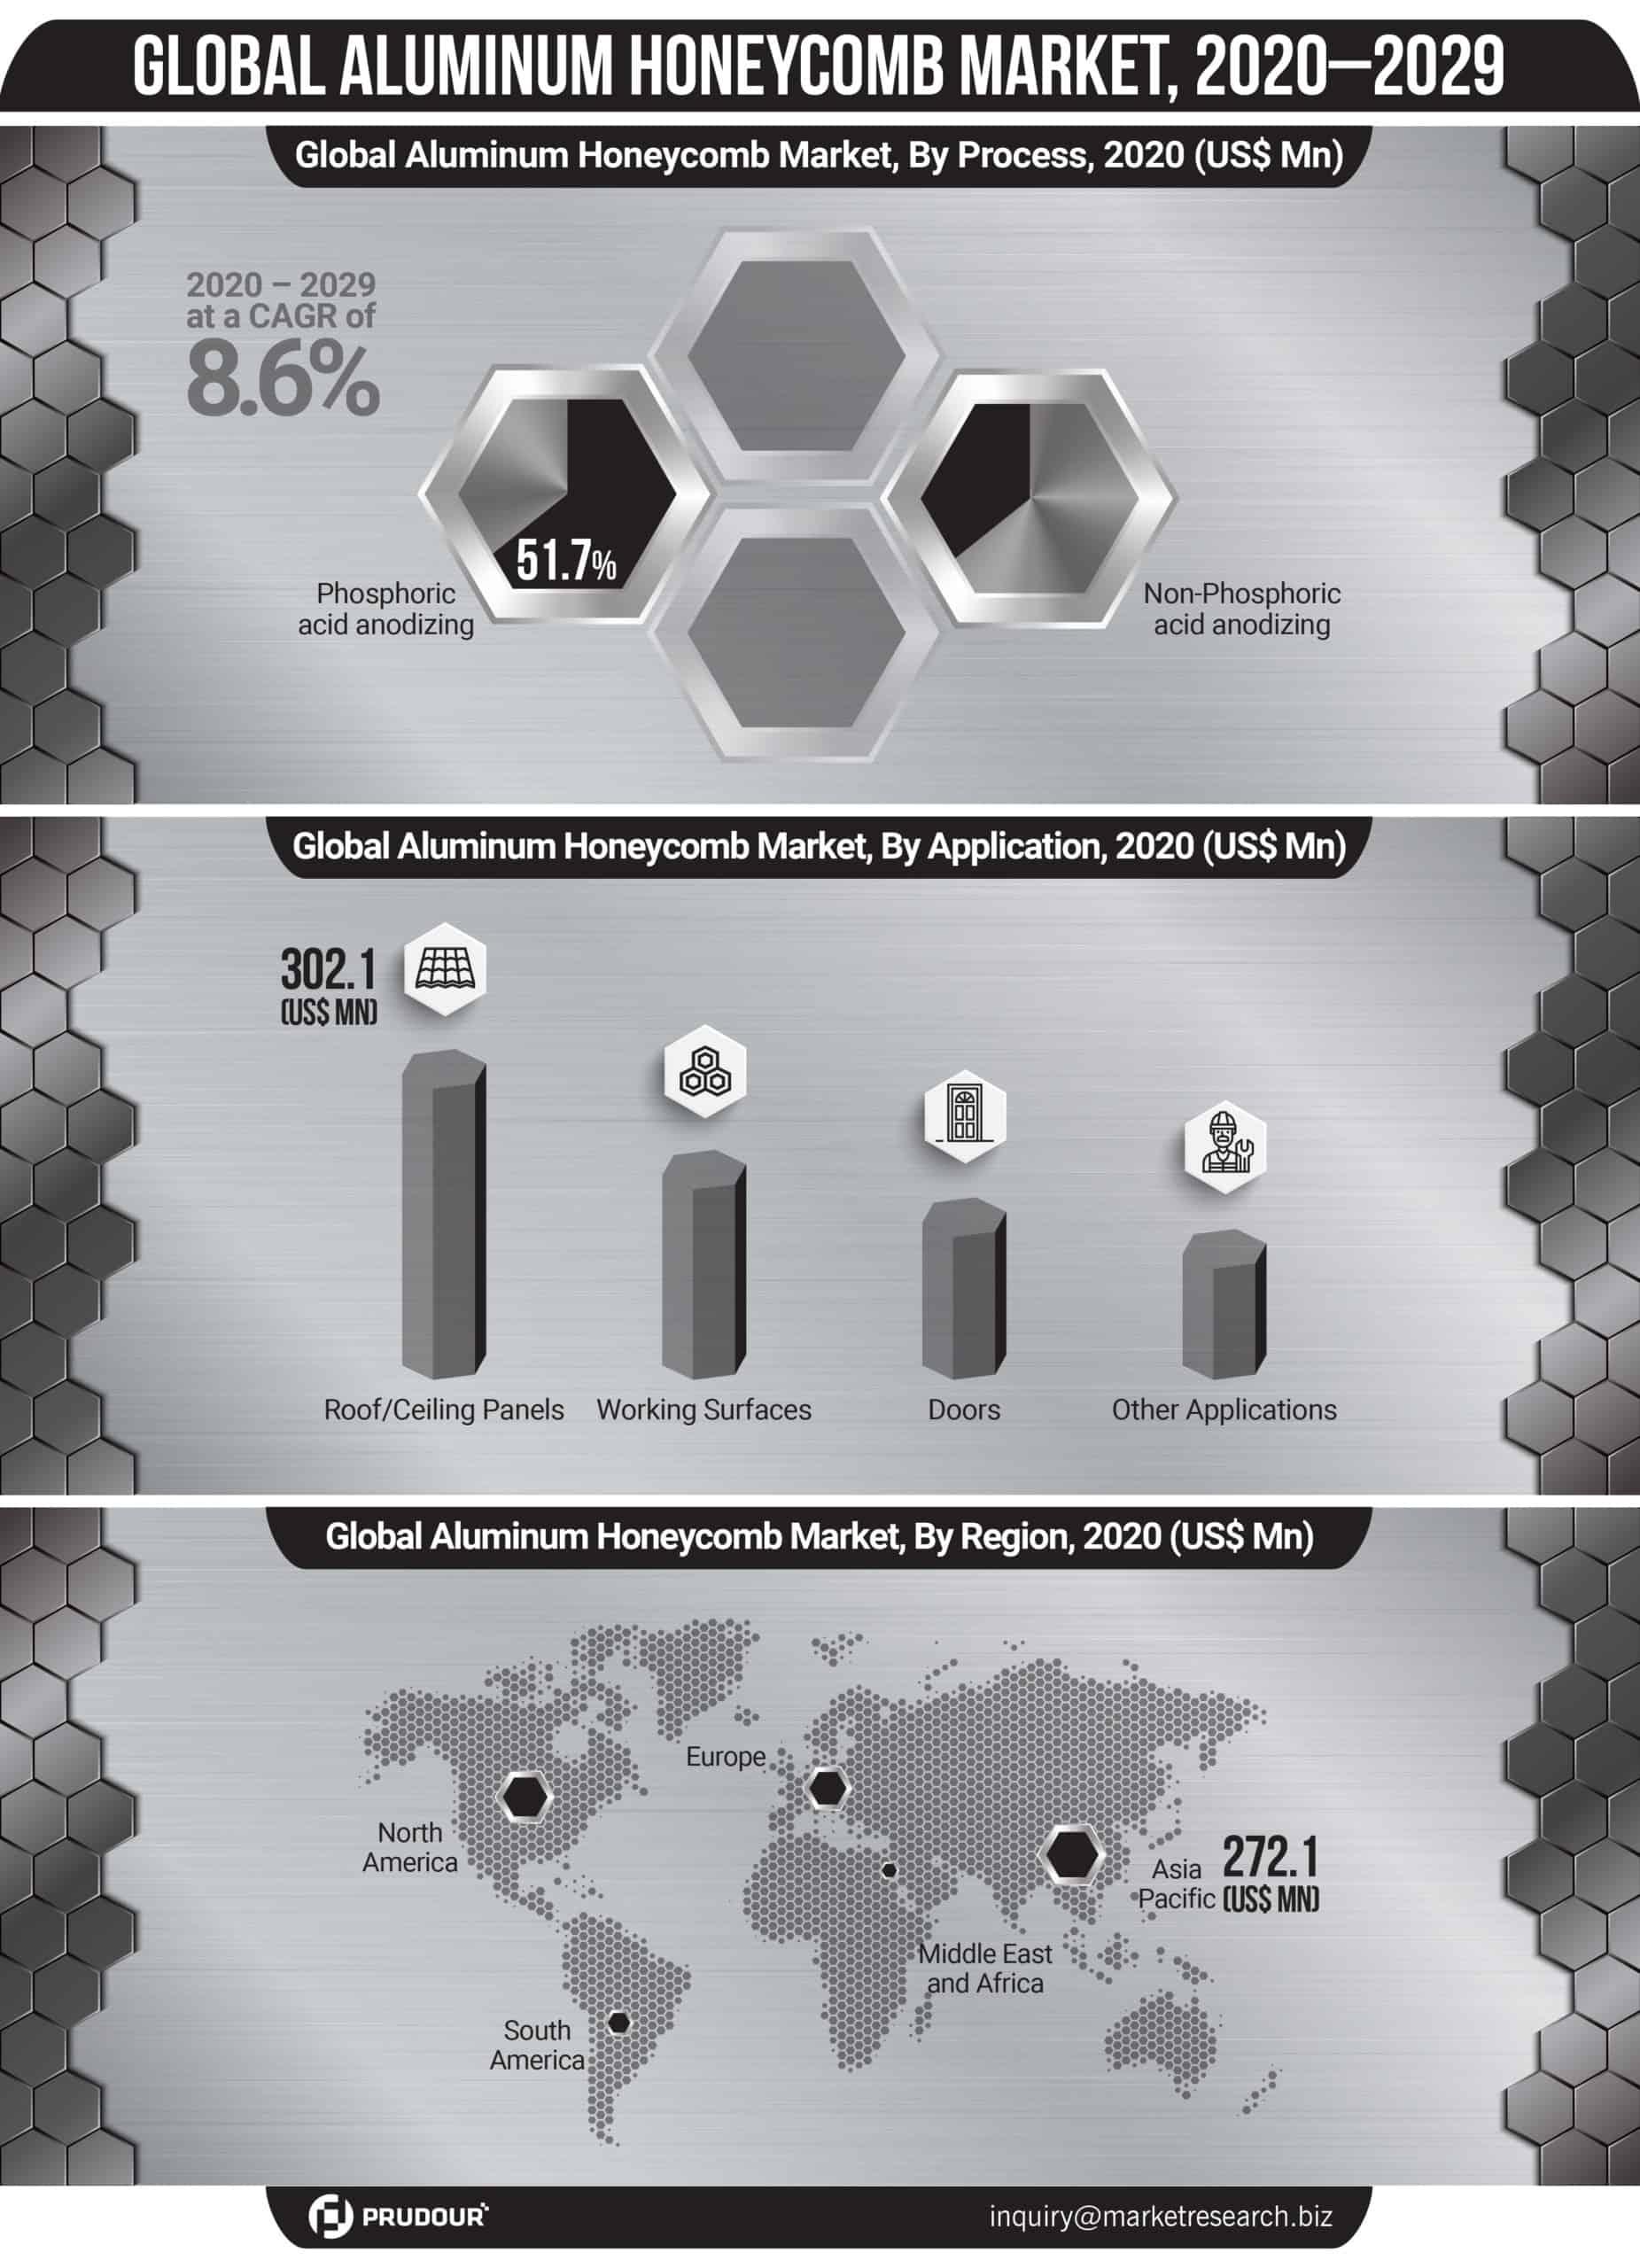 Global Aluminum Honeycomb Market